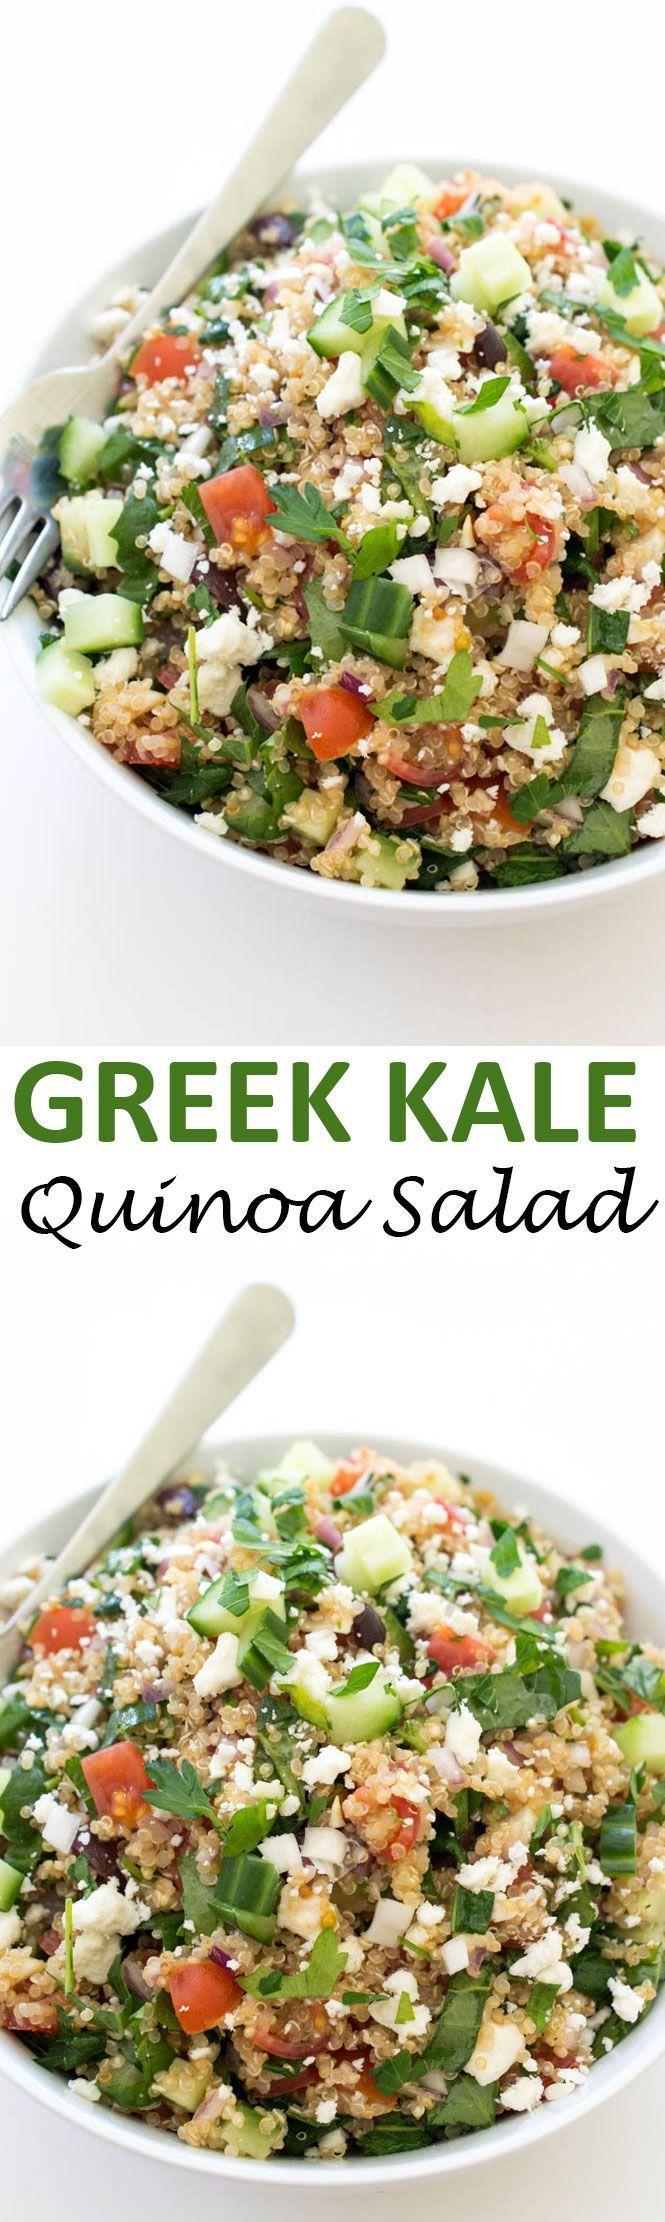 30 Minute Greek Kale Quinoa Salad